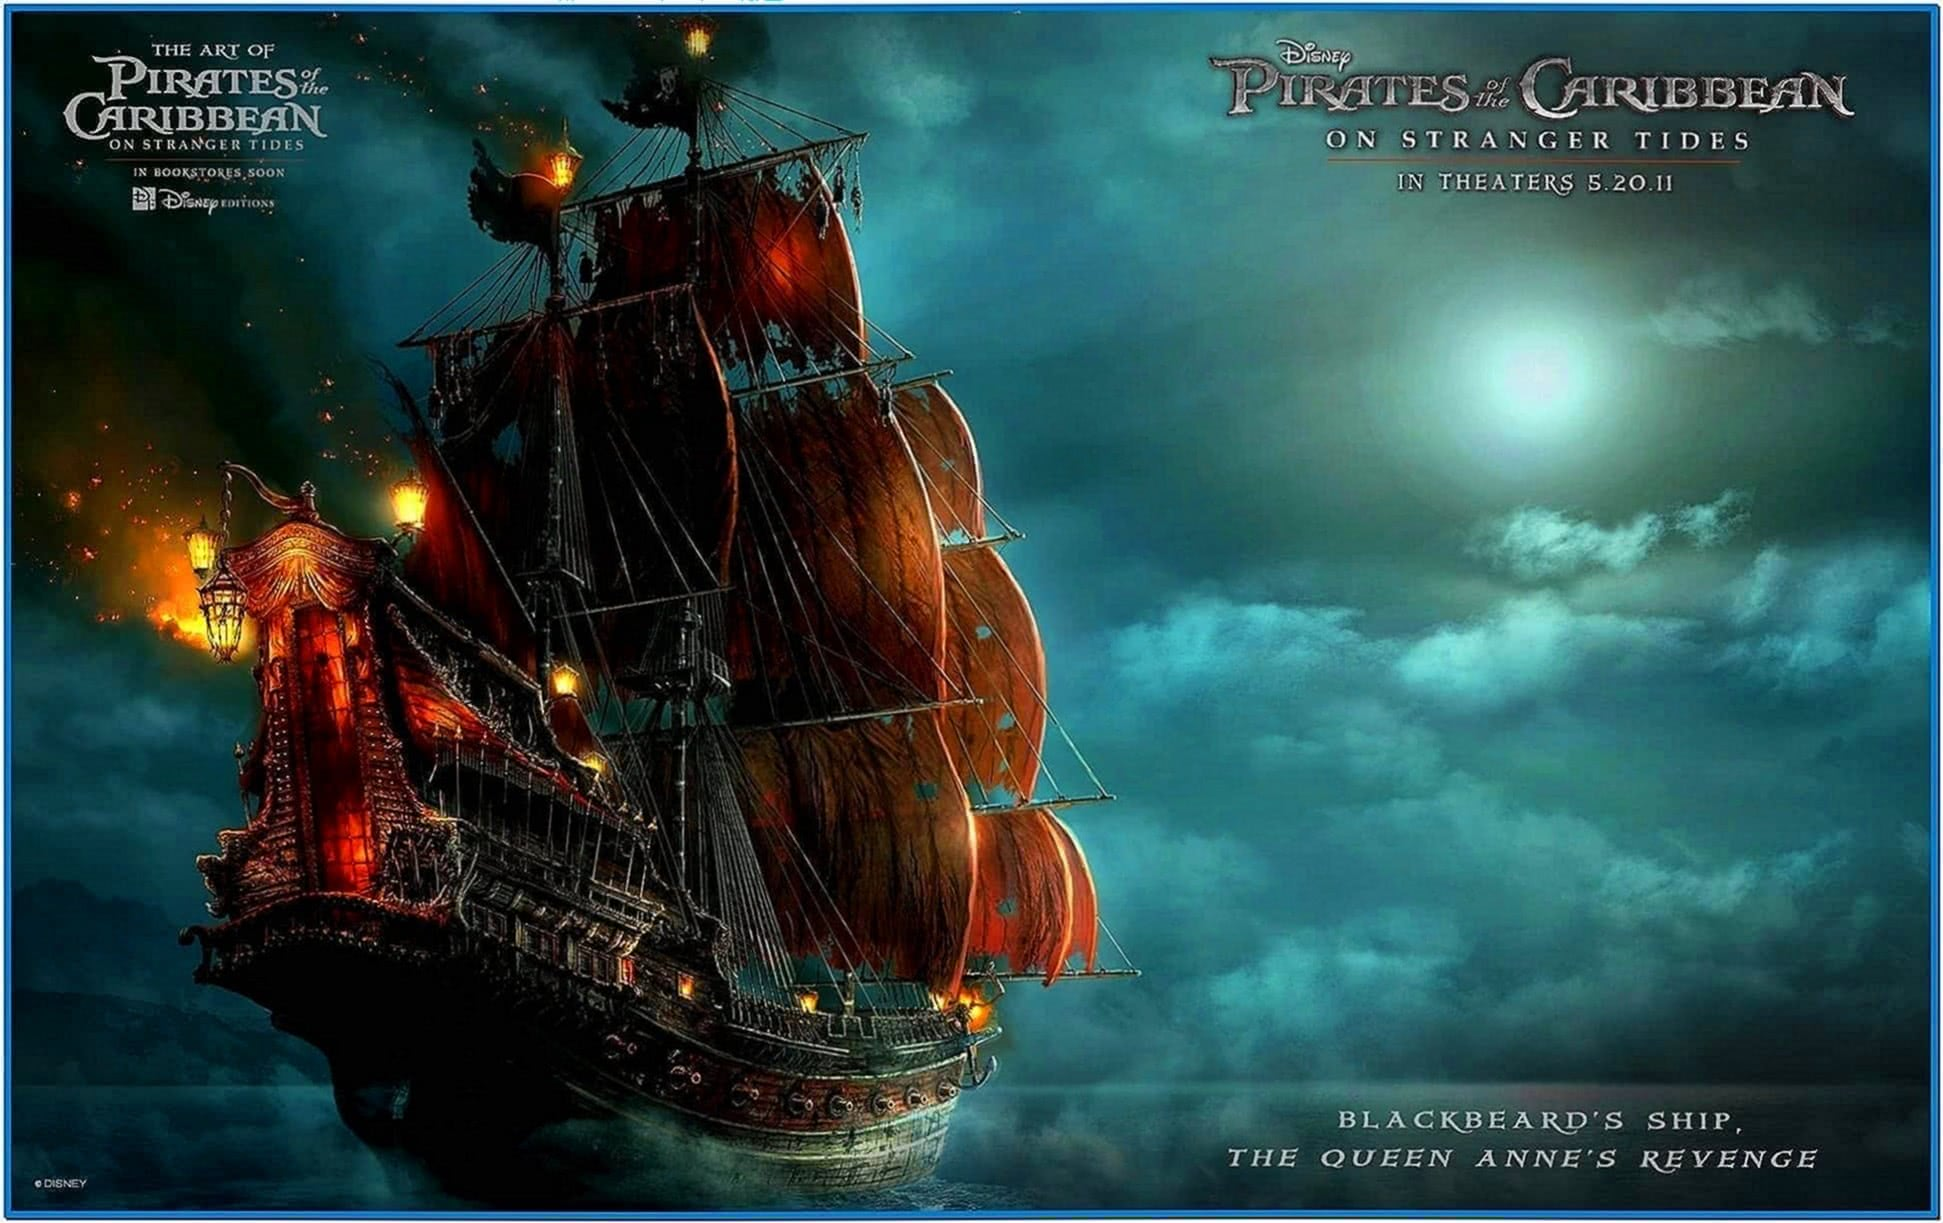 Pirates of The Caribbean 4 Screensaver